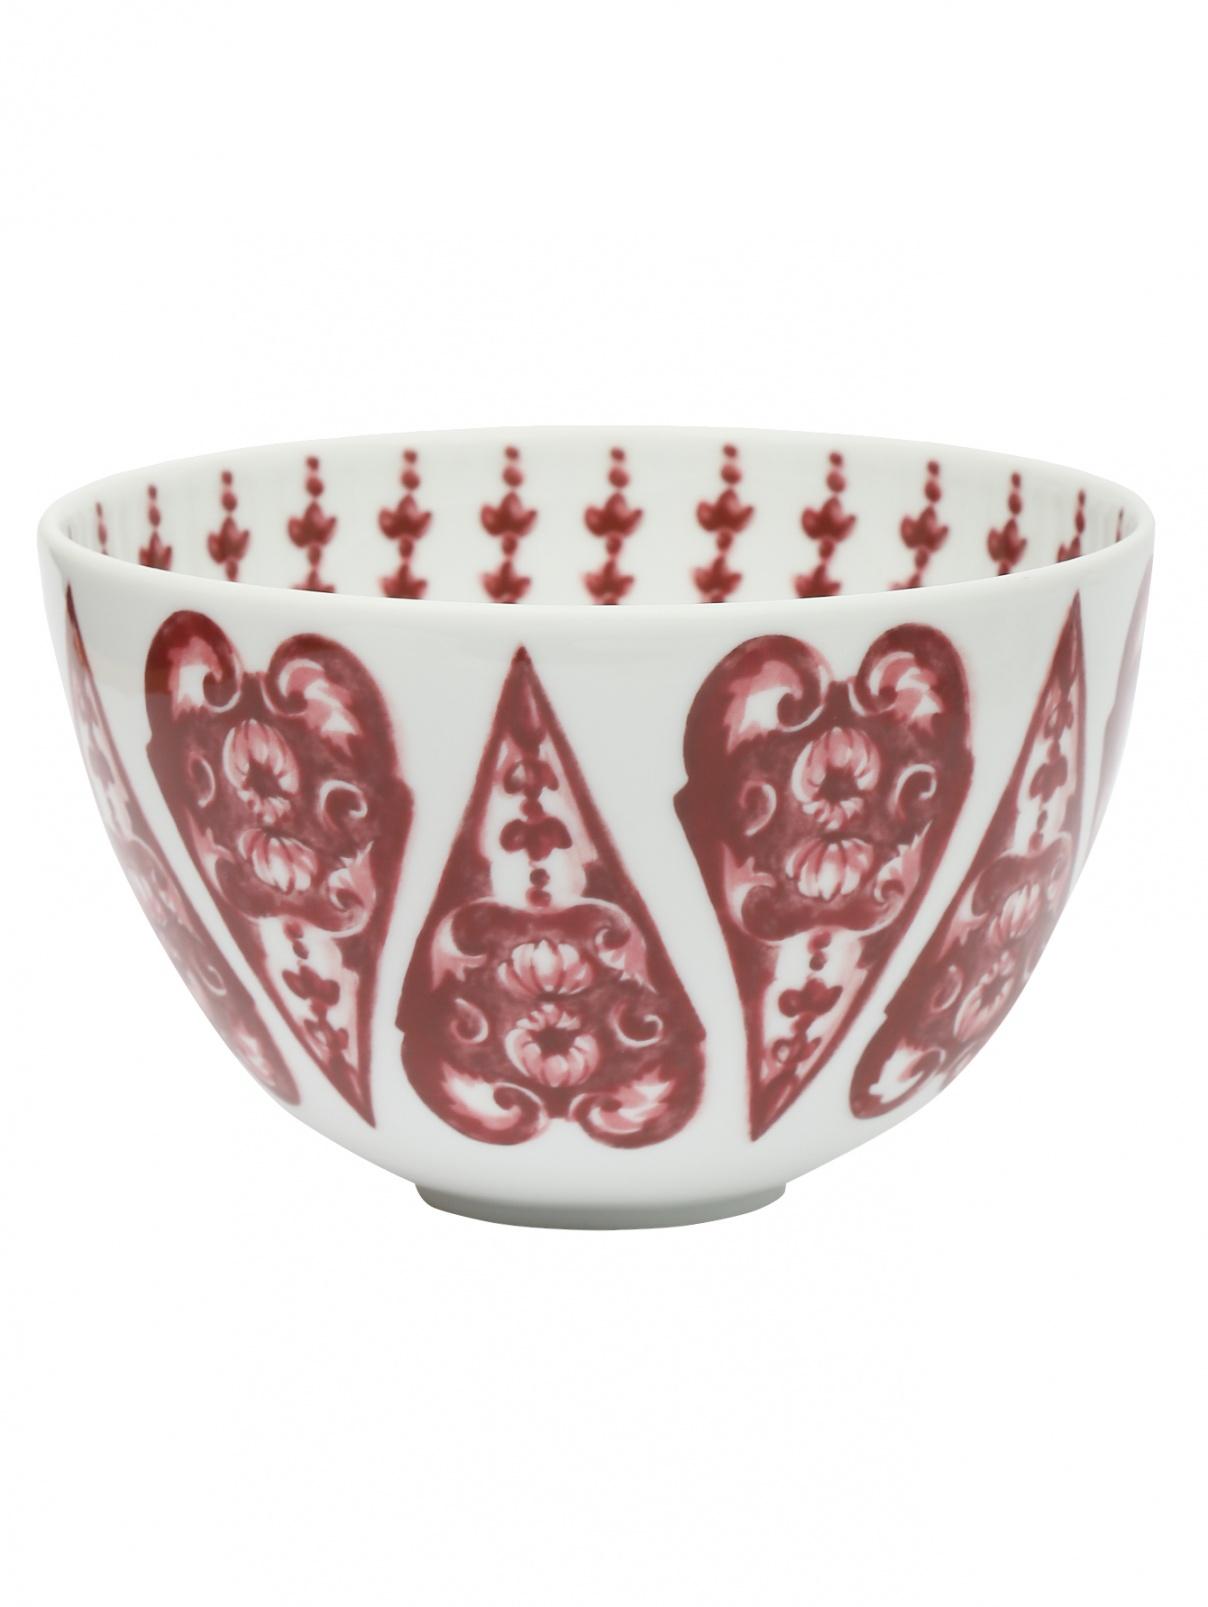 Чаша из фарфора с орнаментом Richard Ginori 1735  –  Общий вид